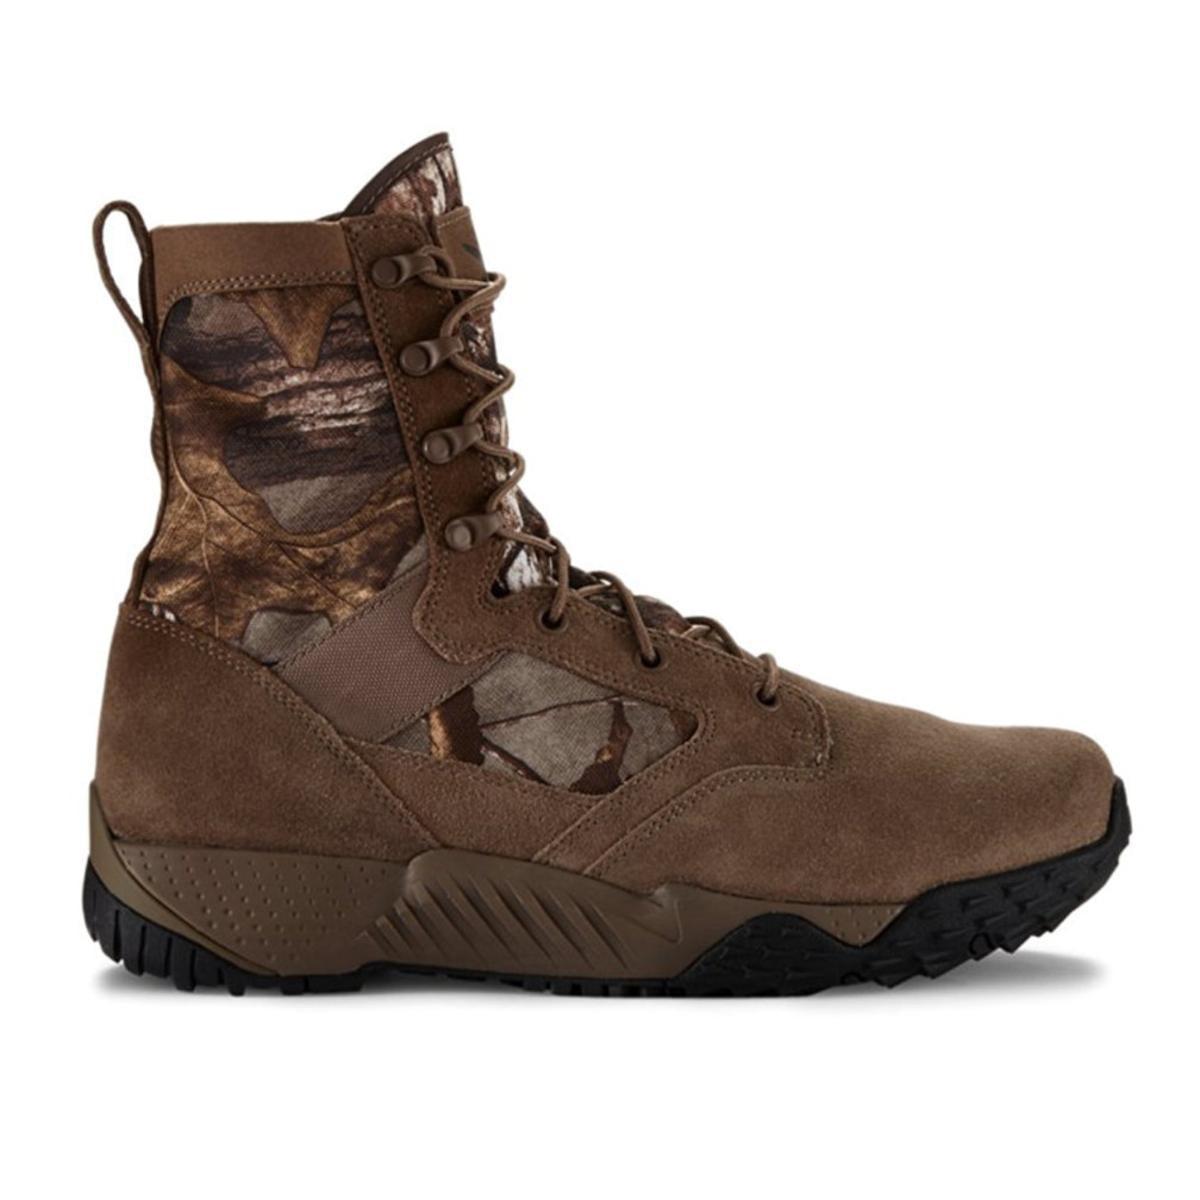 Under Armour UA Jungle Rat Boot, Tactical